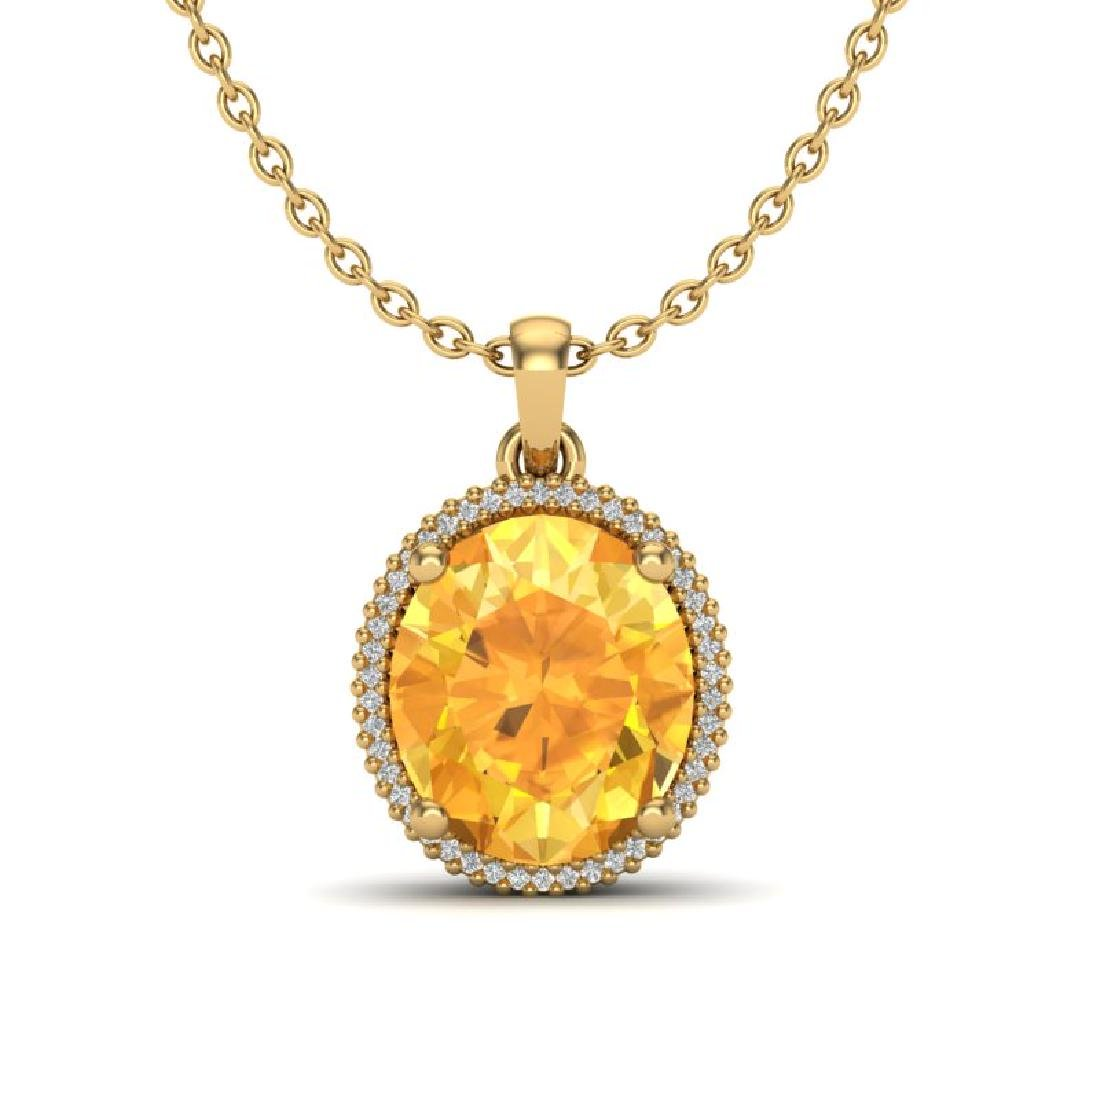 10 CTW Citrine & Micro Pave VS/SI Diamond Halo Necklace